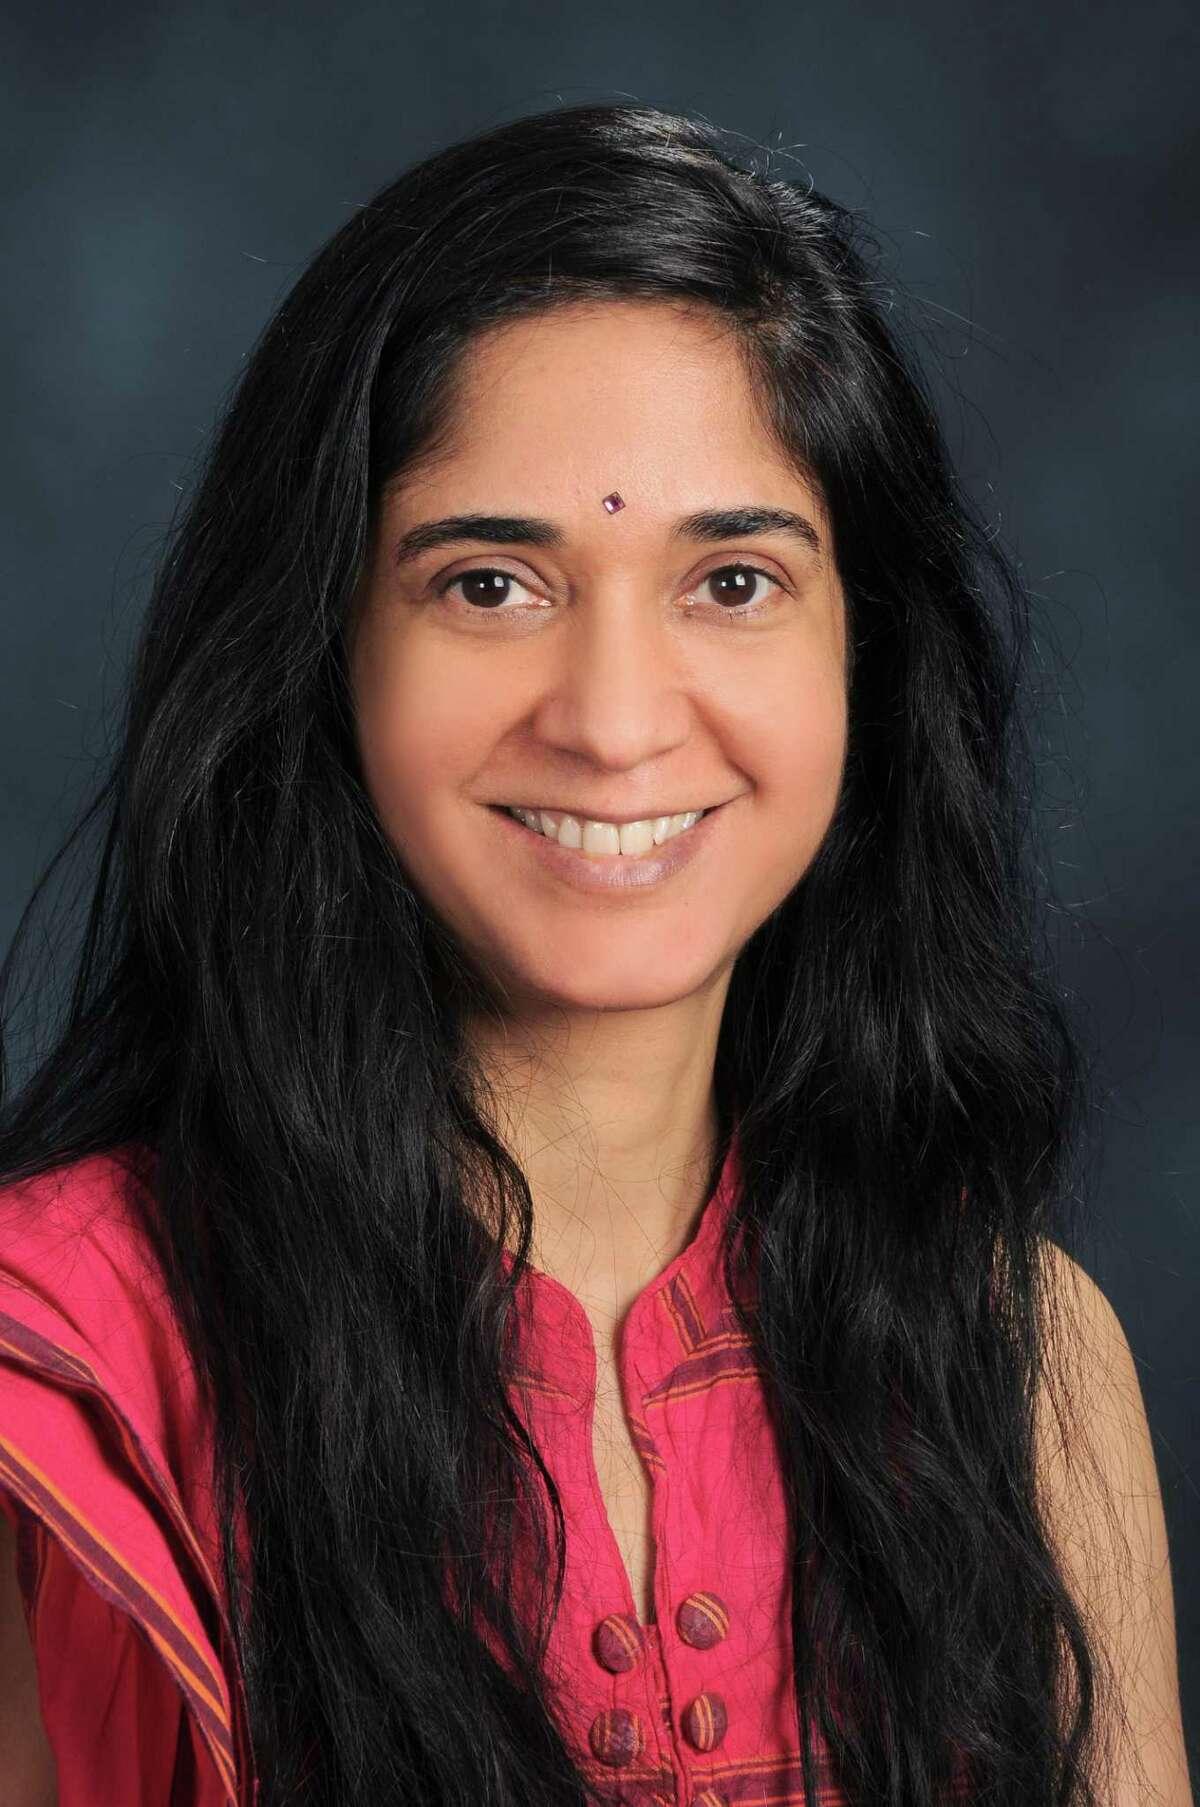 Padma Venkatraman will read from her book,